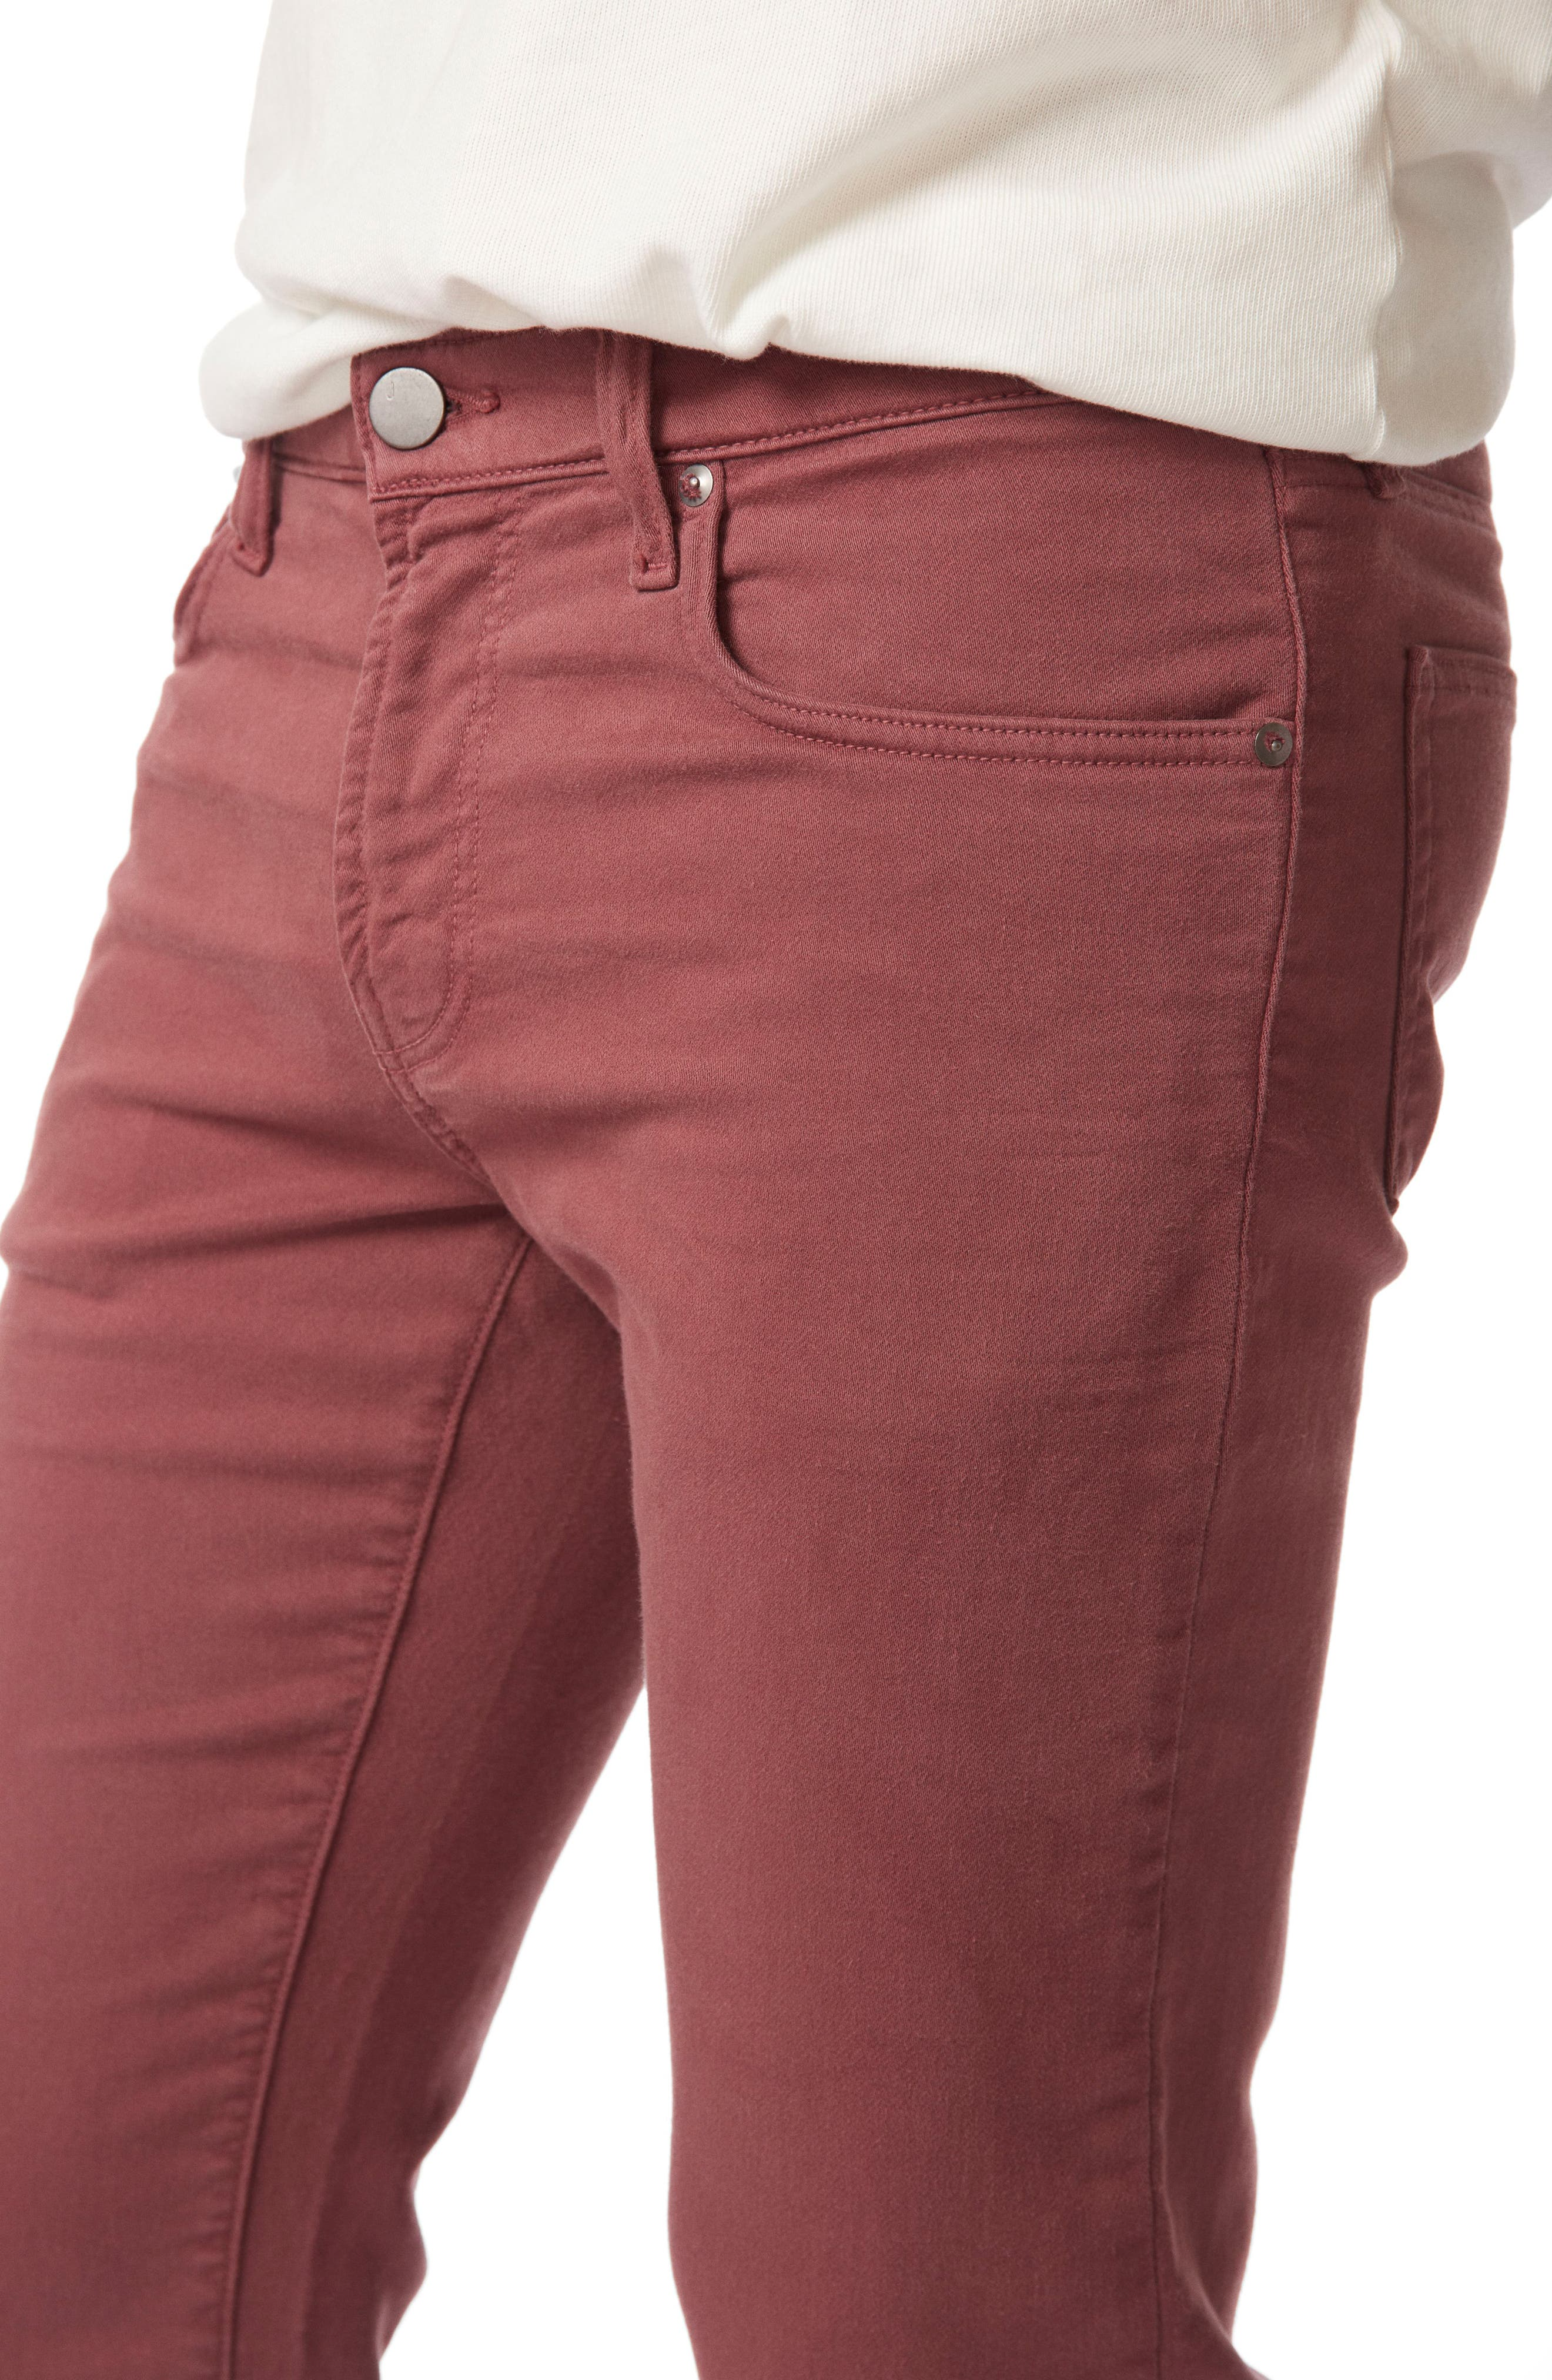 Kane Slim Straight Leg Pants,                             Alternate thumbnail 4, color,                             Keckley Basella